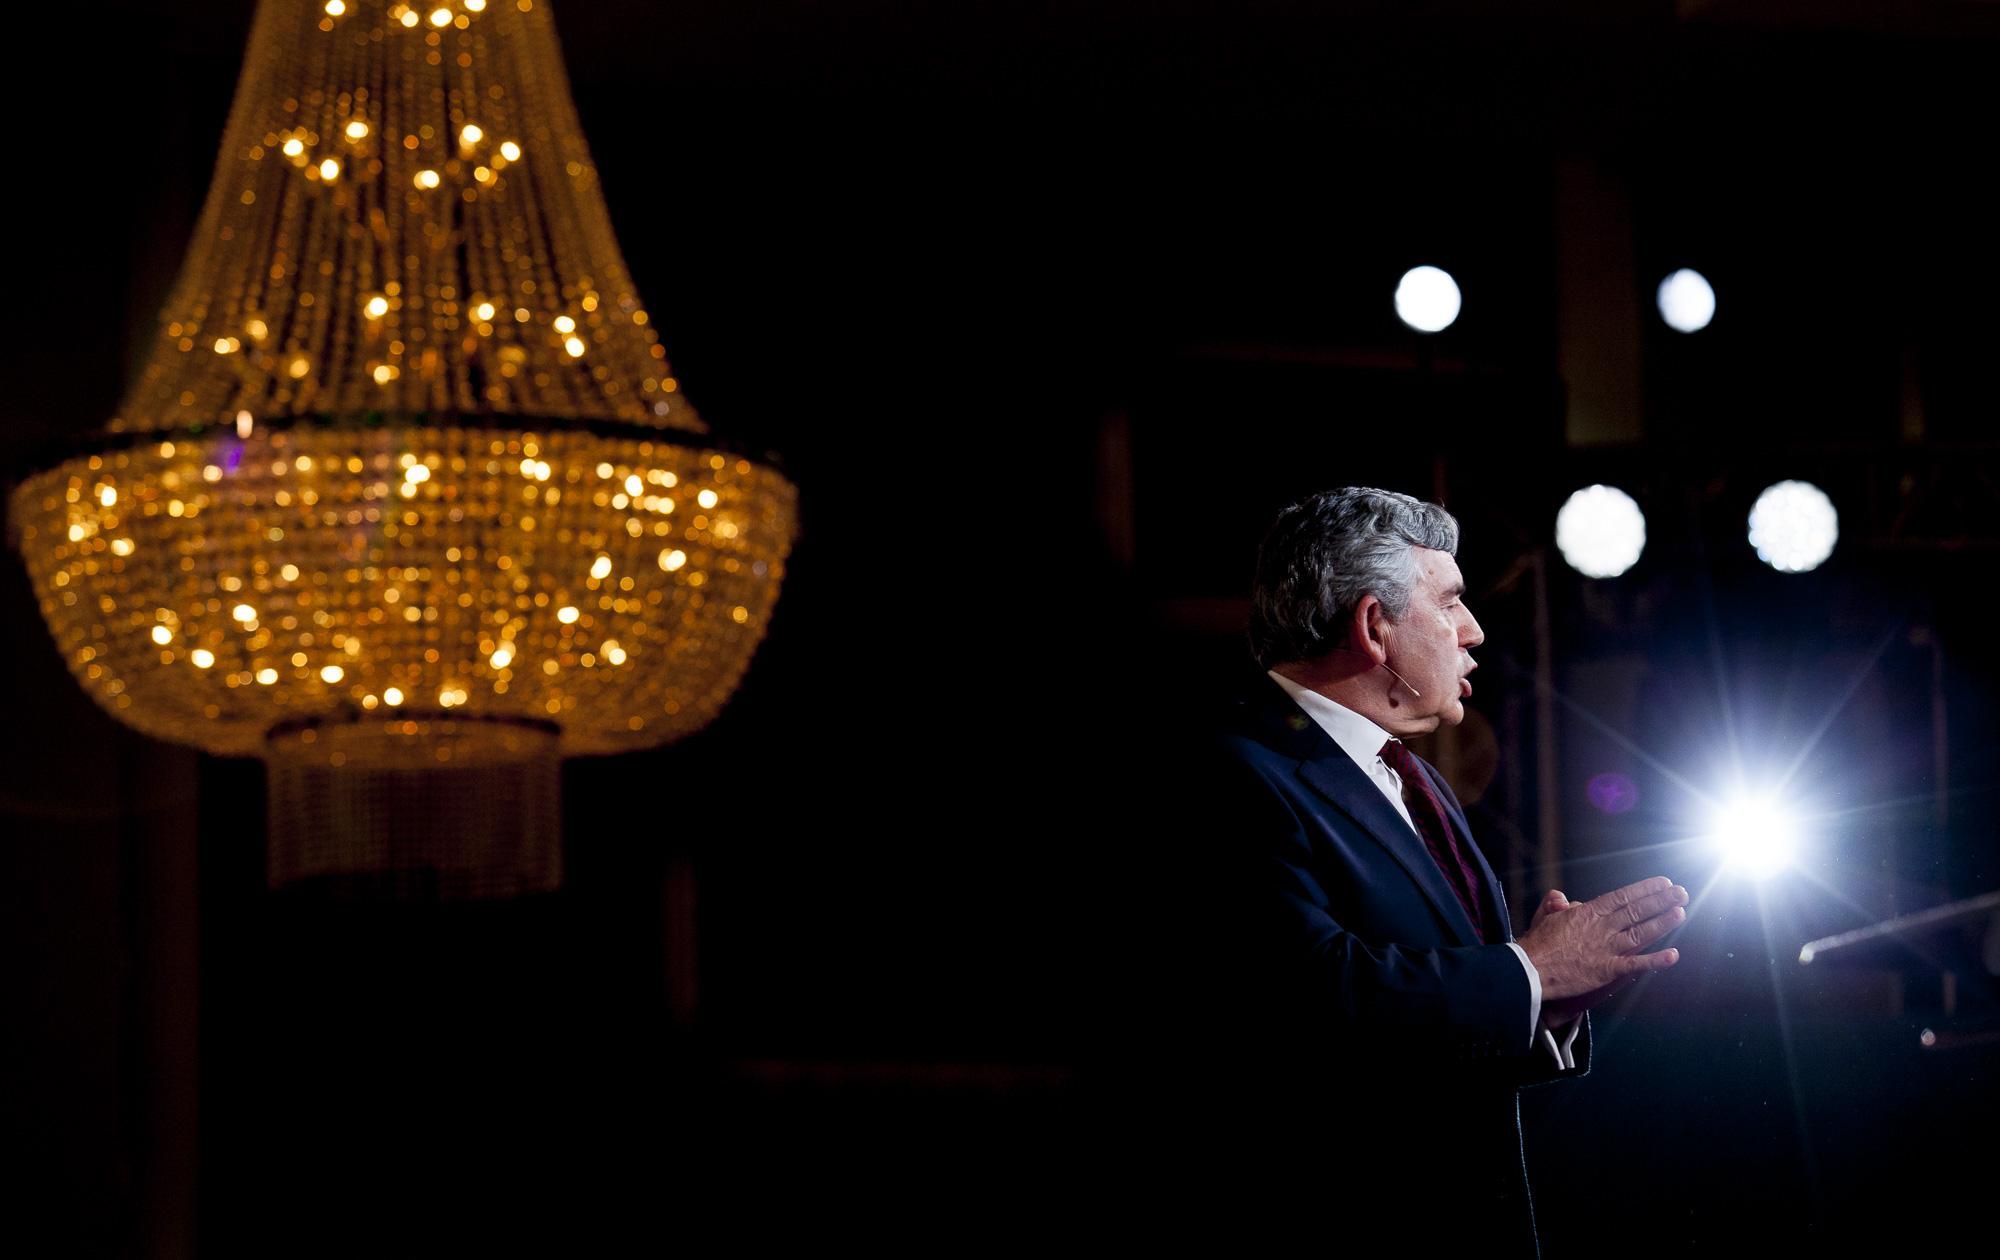 Former Prime Minister of England Gordon Brown